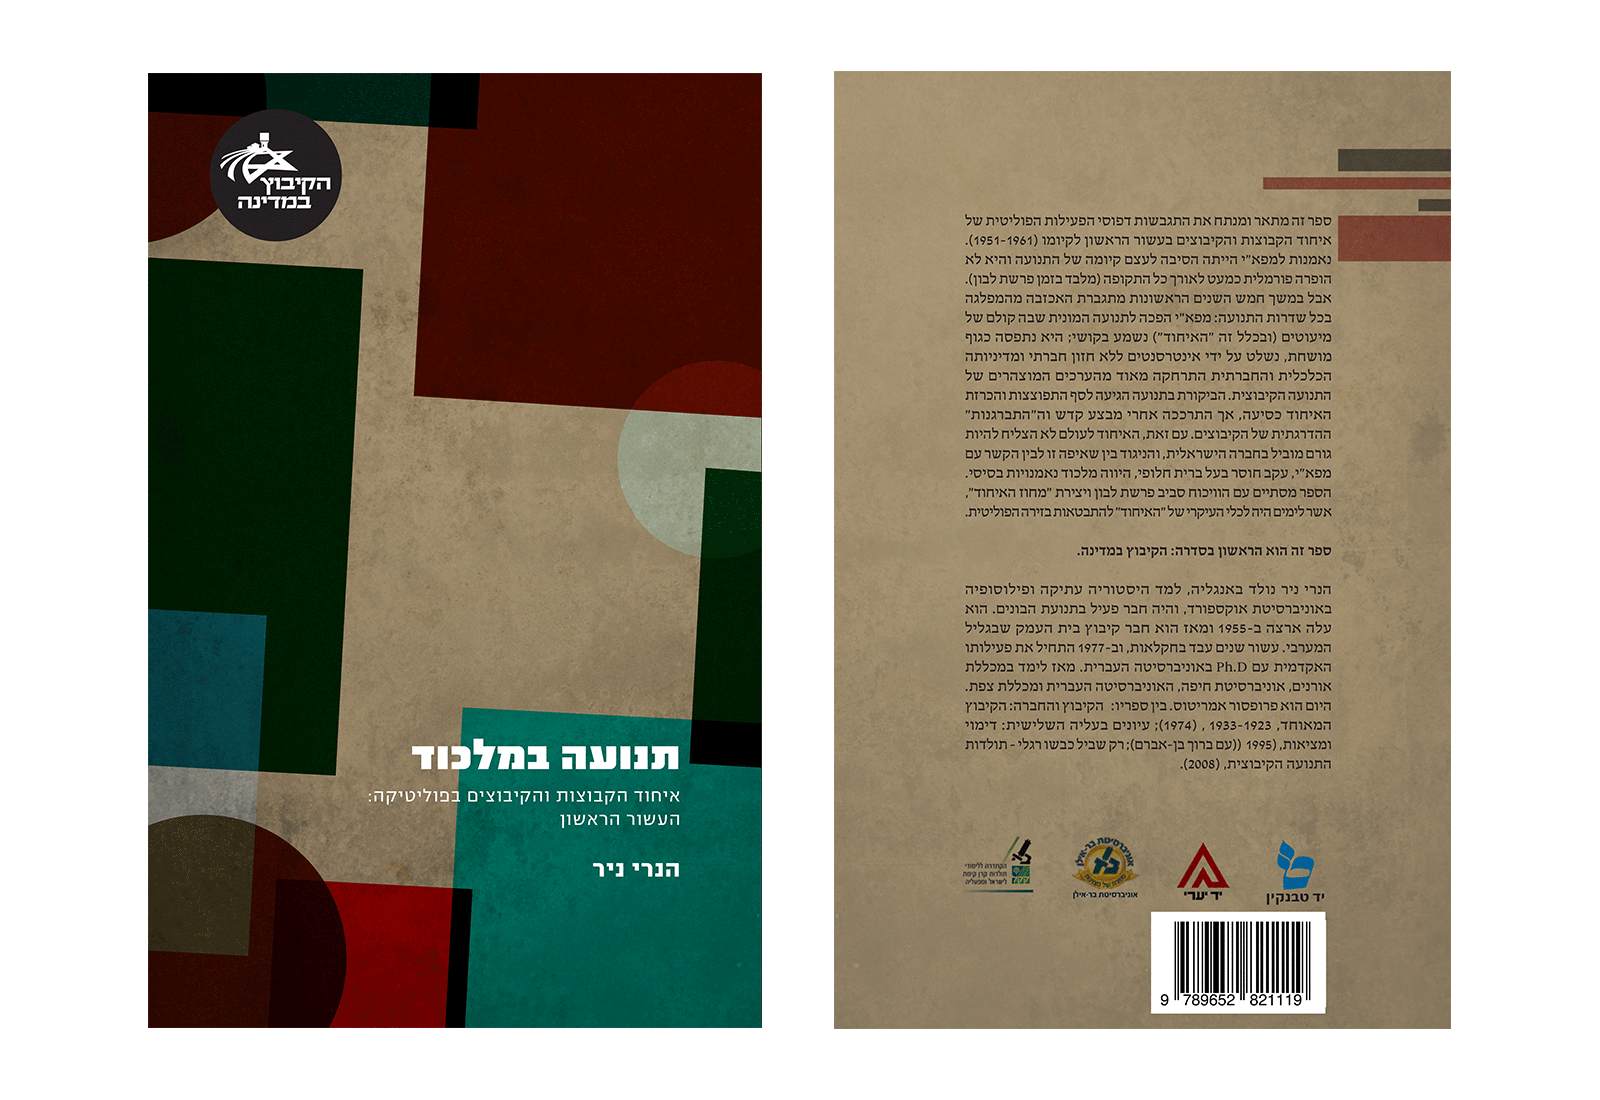 https://bigeyes.co.il/wp-content/uploads/2019/08/kibbutz-books-5.png